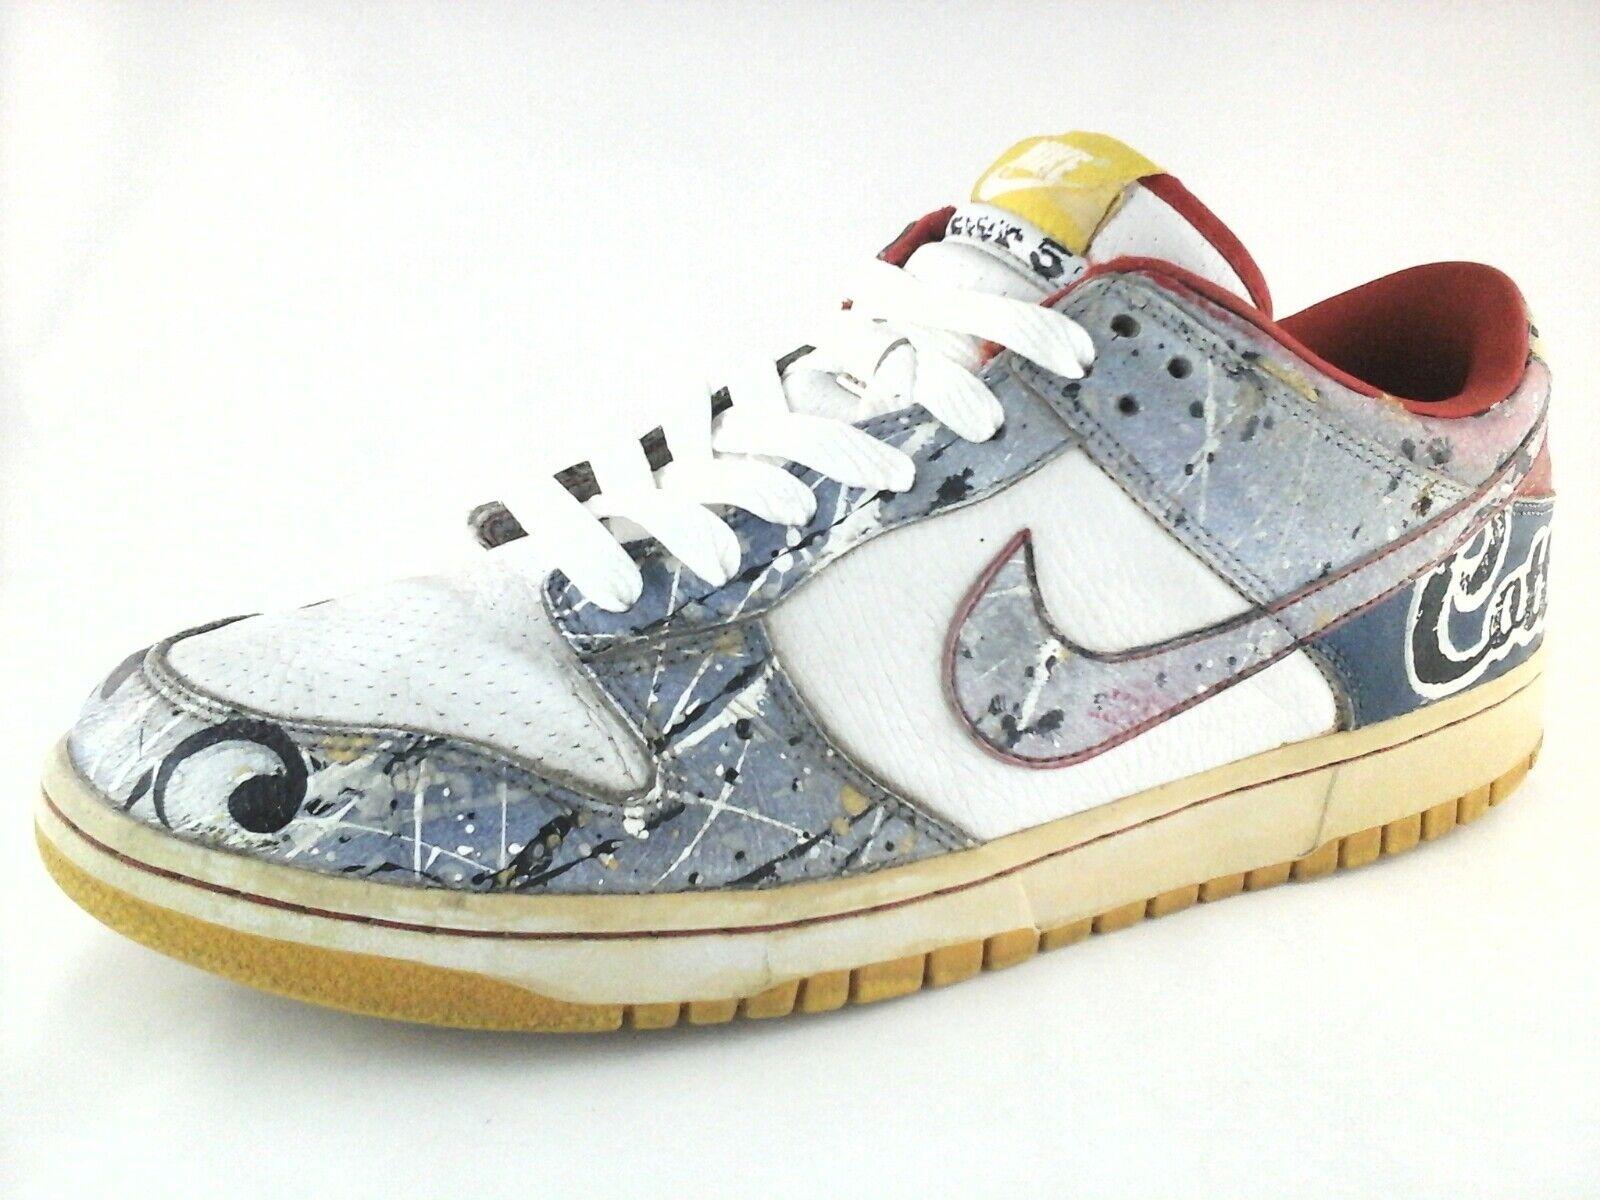 NIKE chaussures Custom Cottonwood Church Bible Verse homme Sneakers US 12 EU 45 RARE